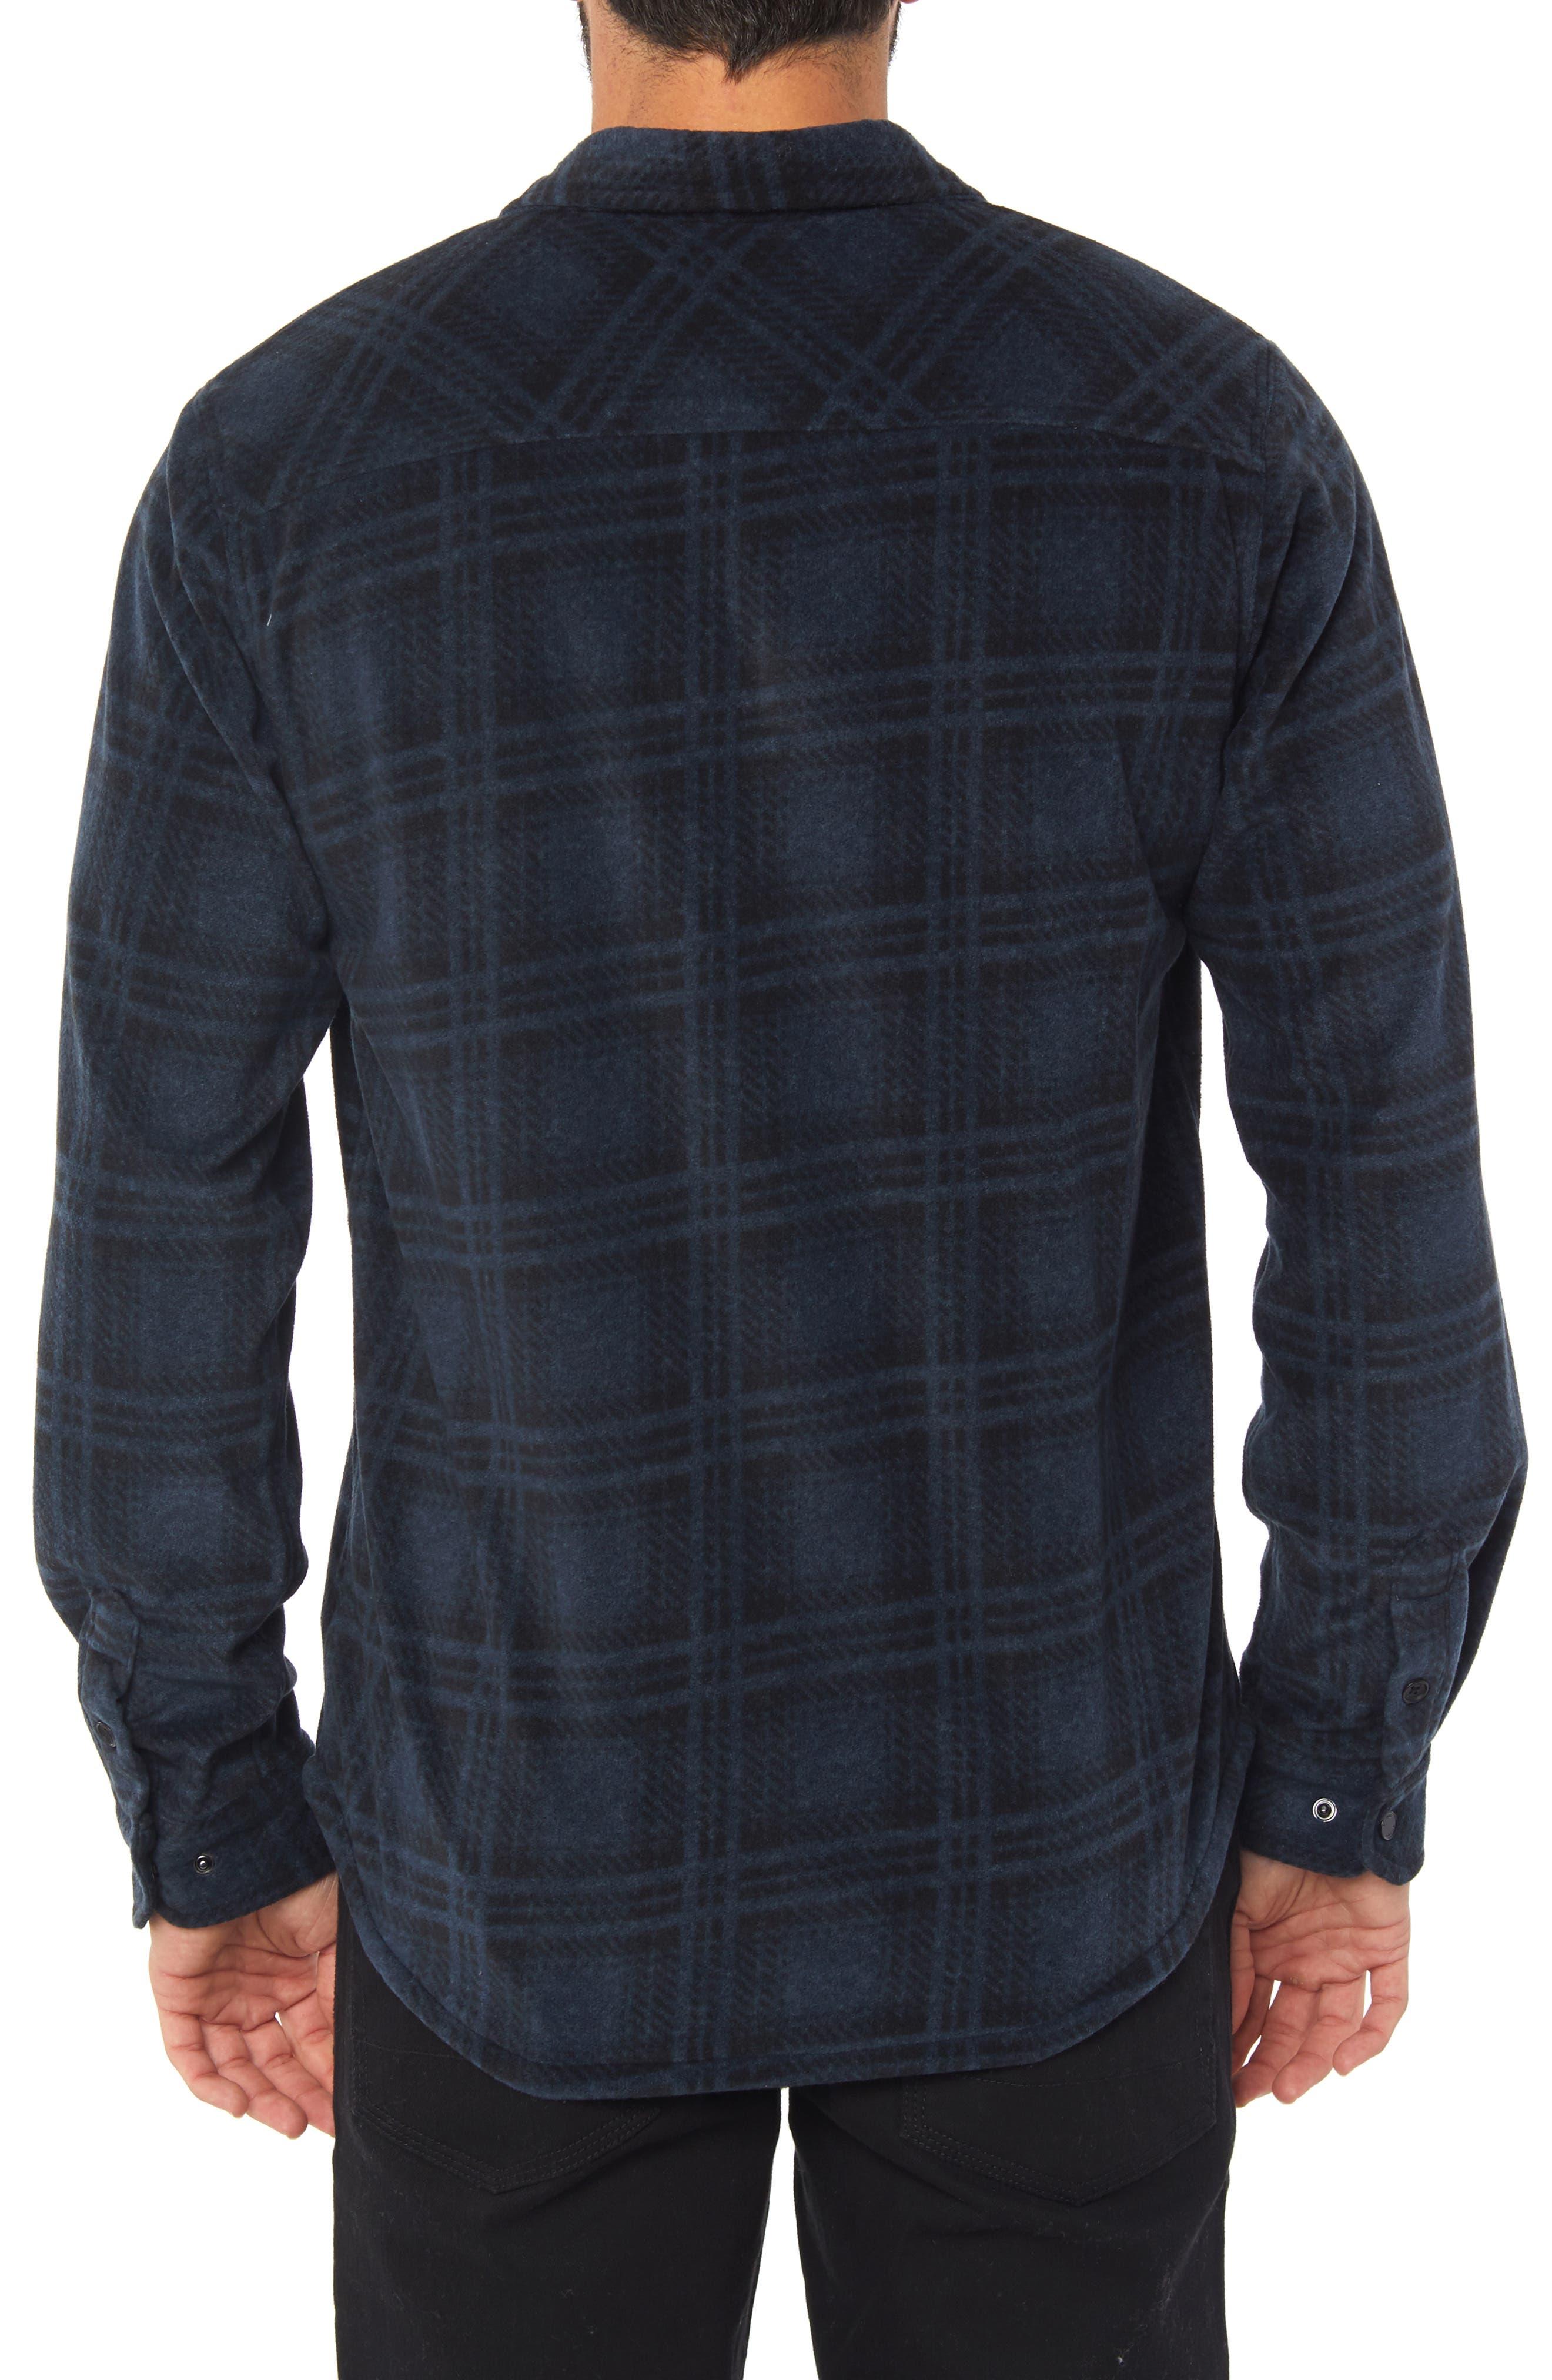 Glacier Ridge Long Sleeve Shirt,                             Alternate thumbnail 2, color,                             DARK NAVY